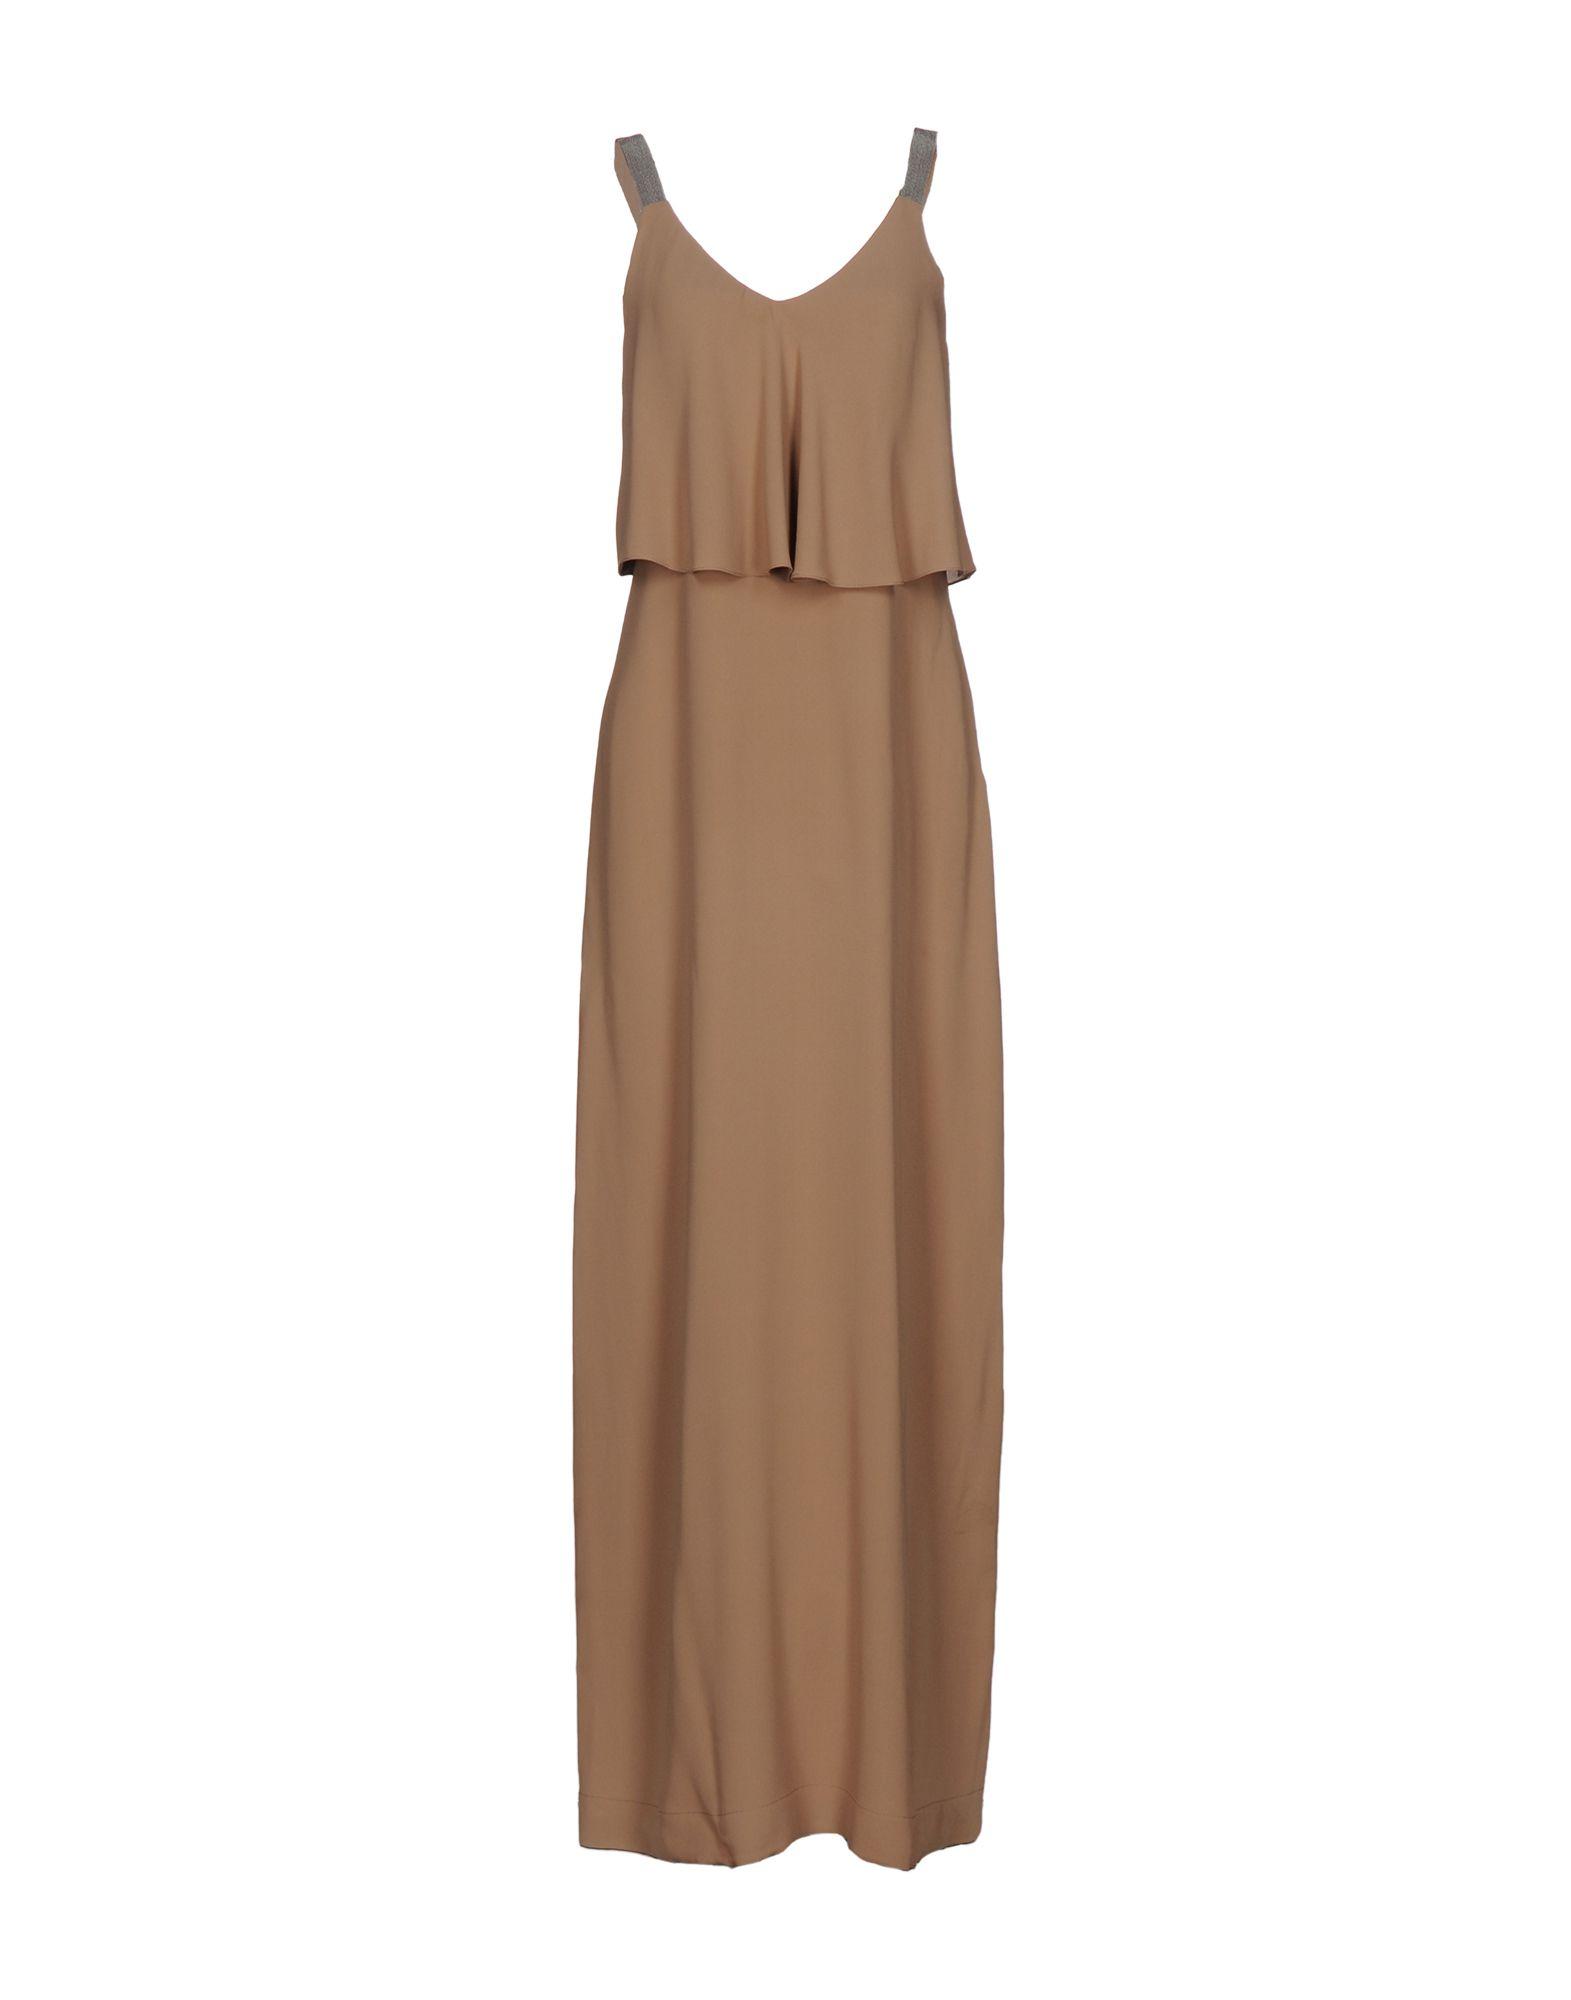 BRUNELLO CUCINELLI Длинное платье платье длинное без рукавов из кружева bina